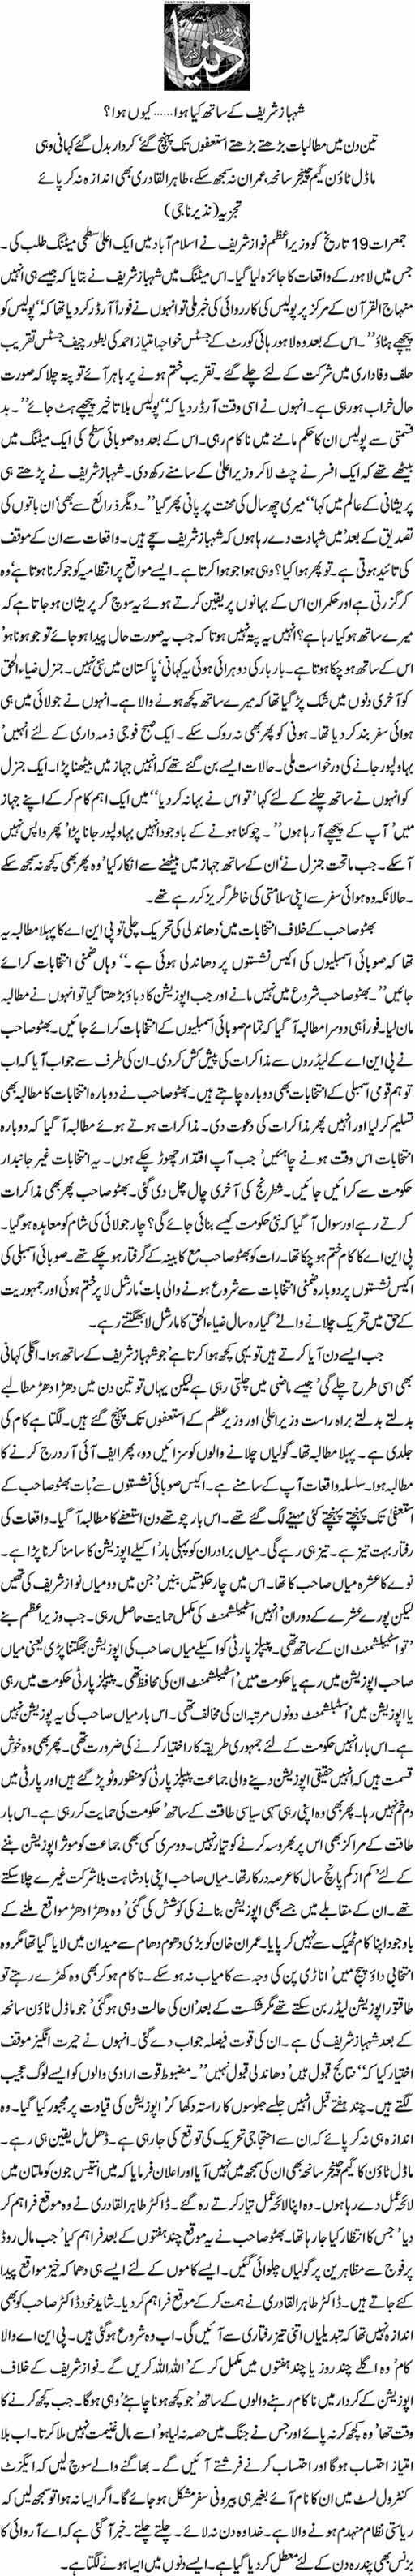 Print Media Coverage Dunya News - Nazir Naji